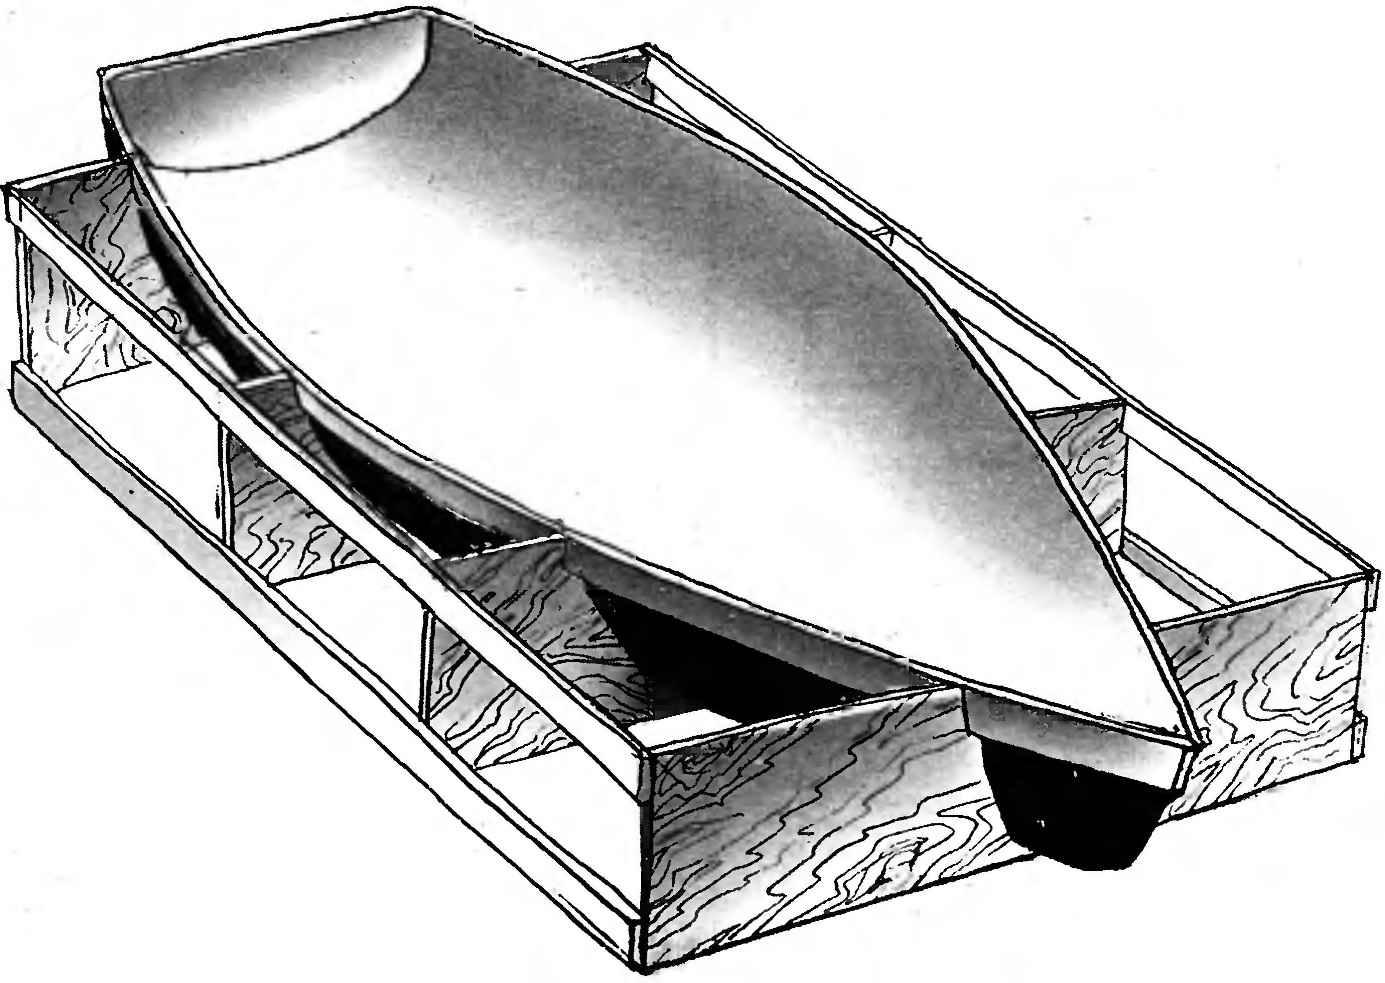 Рис. 2. Матрица для формования стеклопластикового корпуса